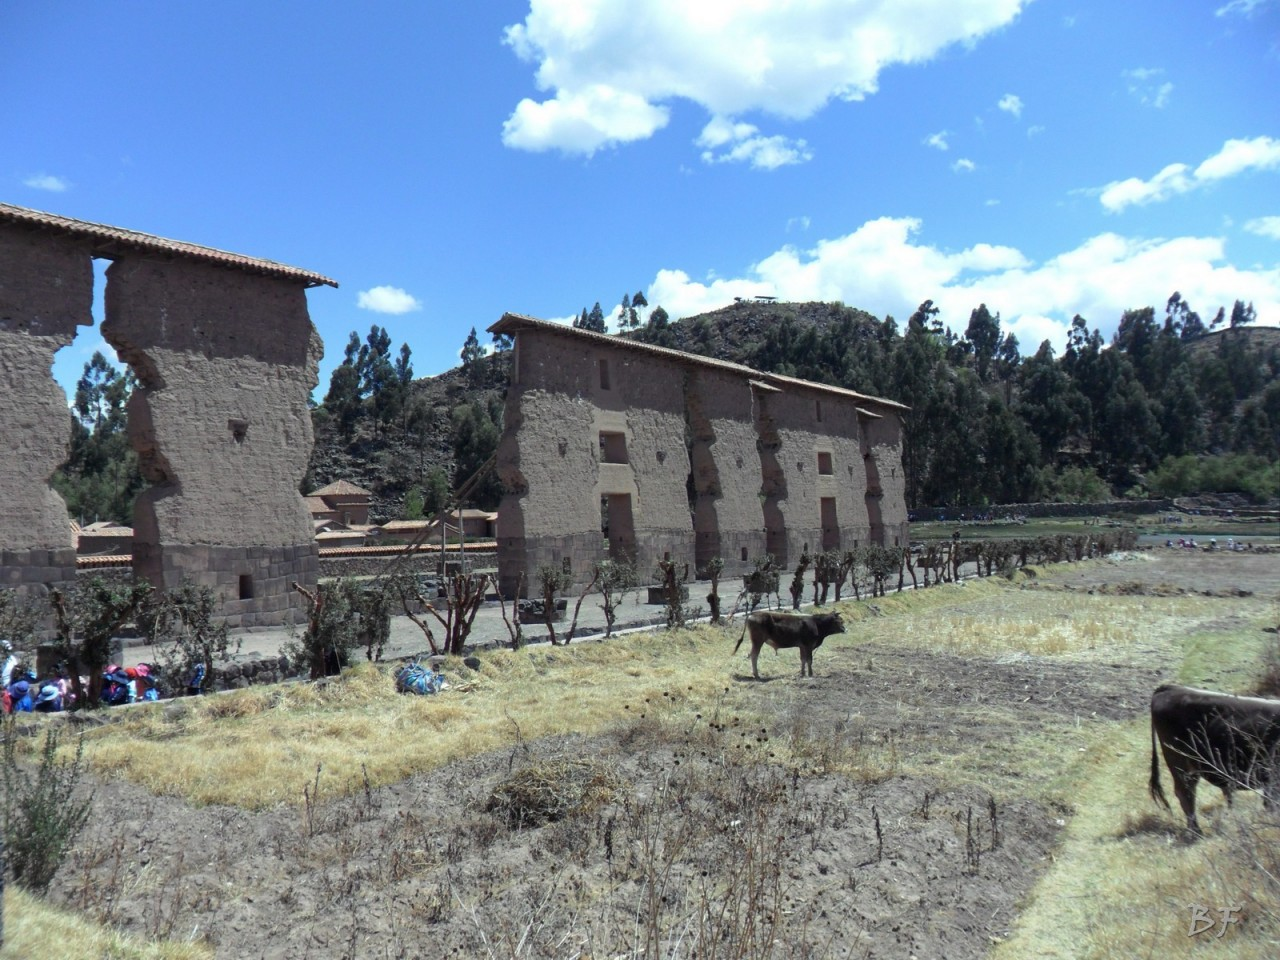 Tempio-di-Viracocha-Megaliti-San-Pedro-Cusco-Perù-10